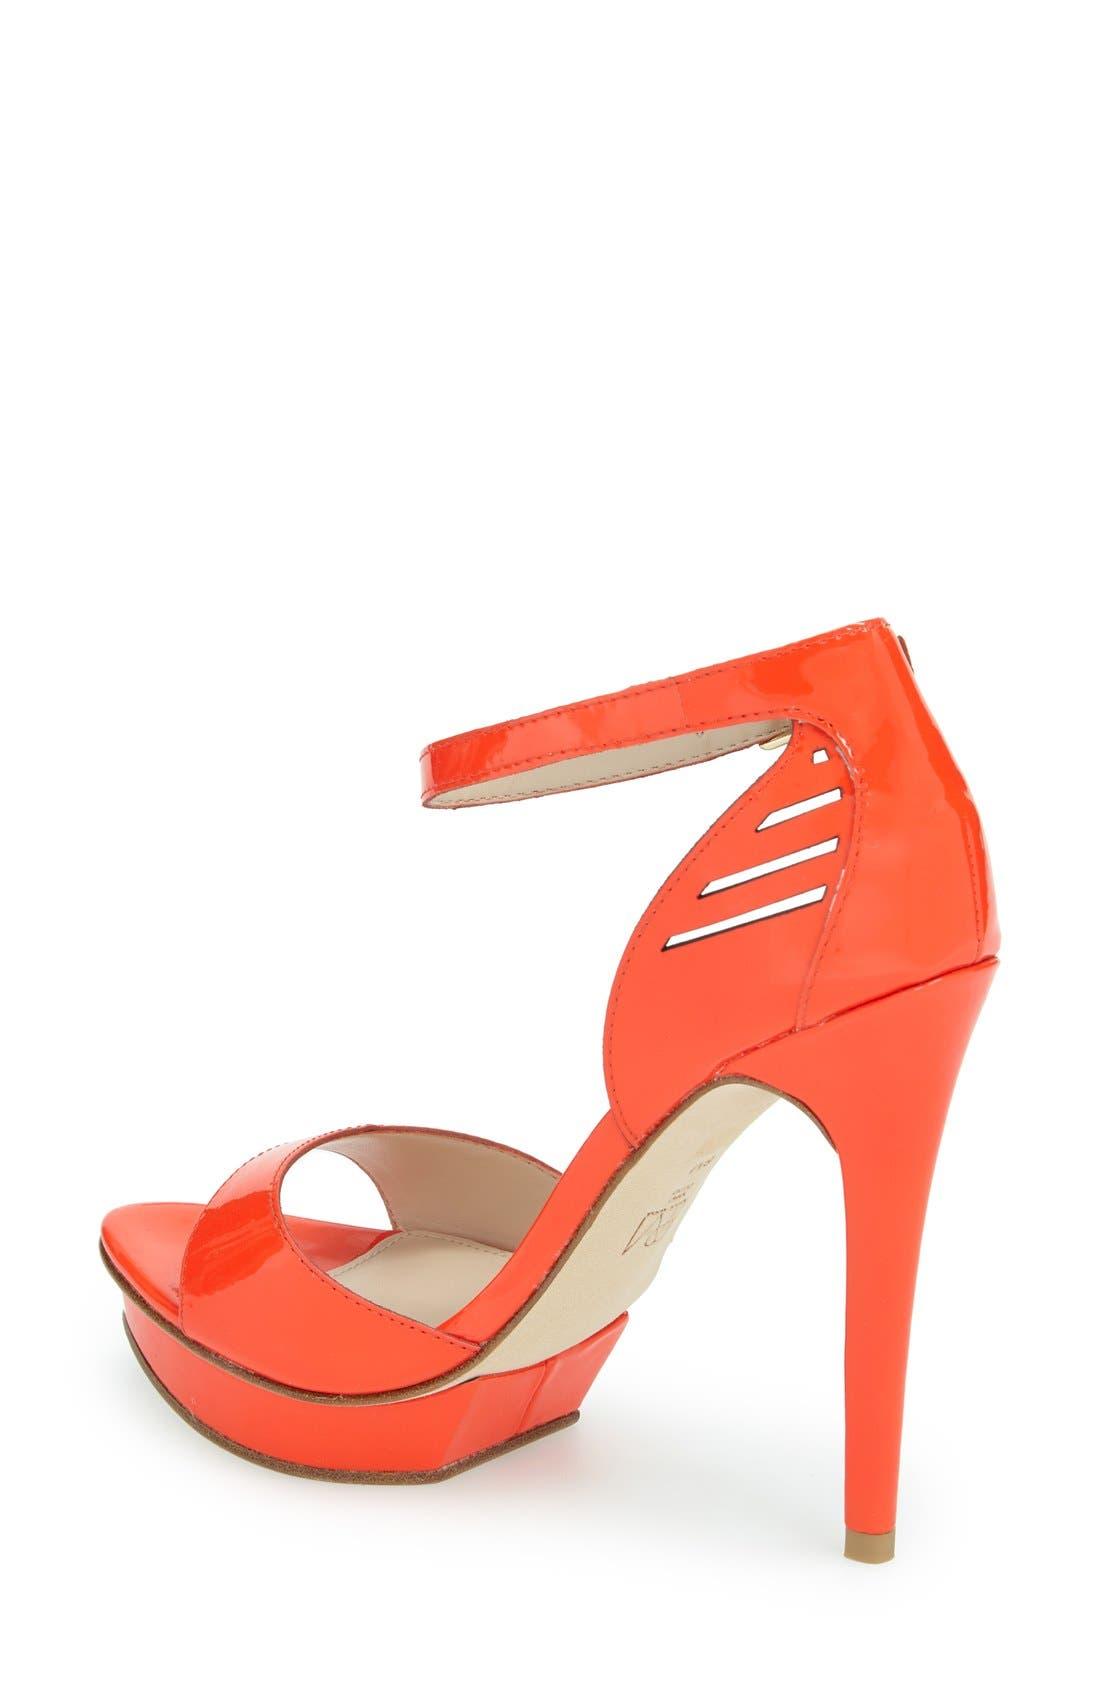 'Fenton' Ankle Strap Sandal,                             Alternate thumbnail 27, color,